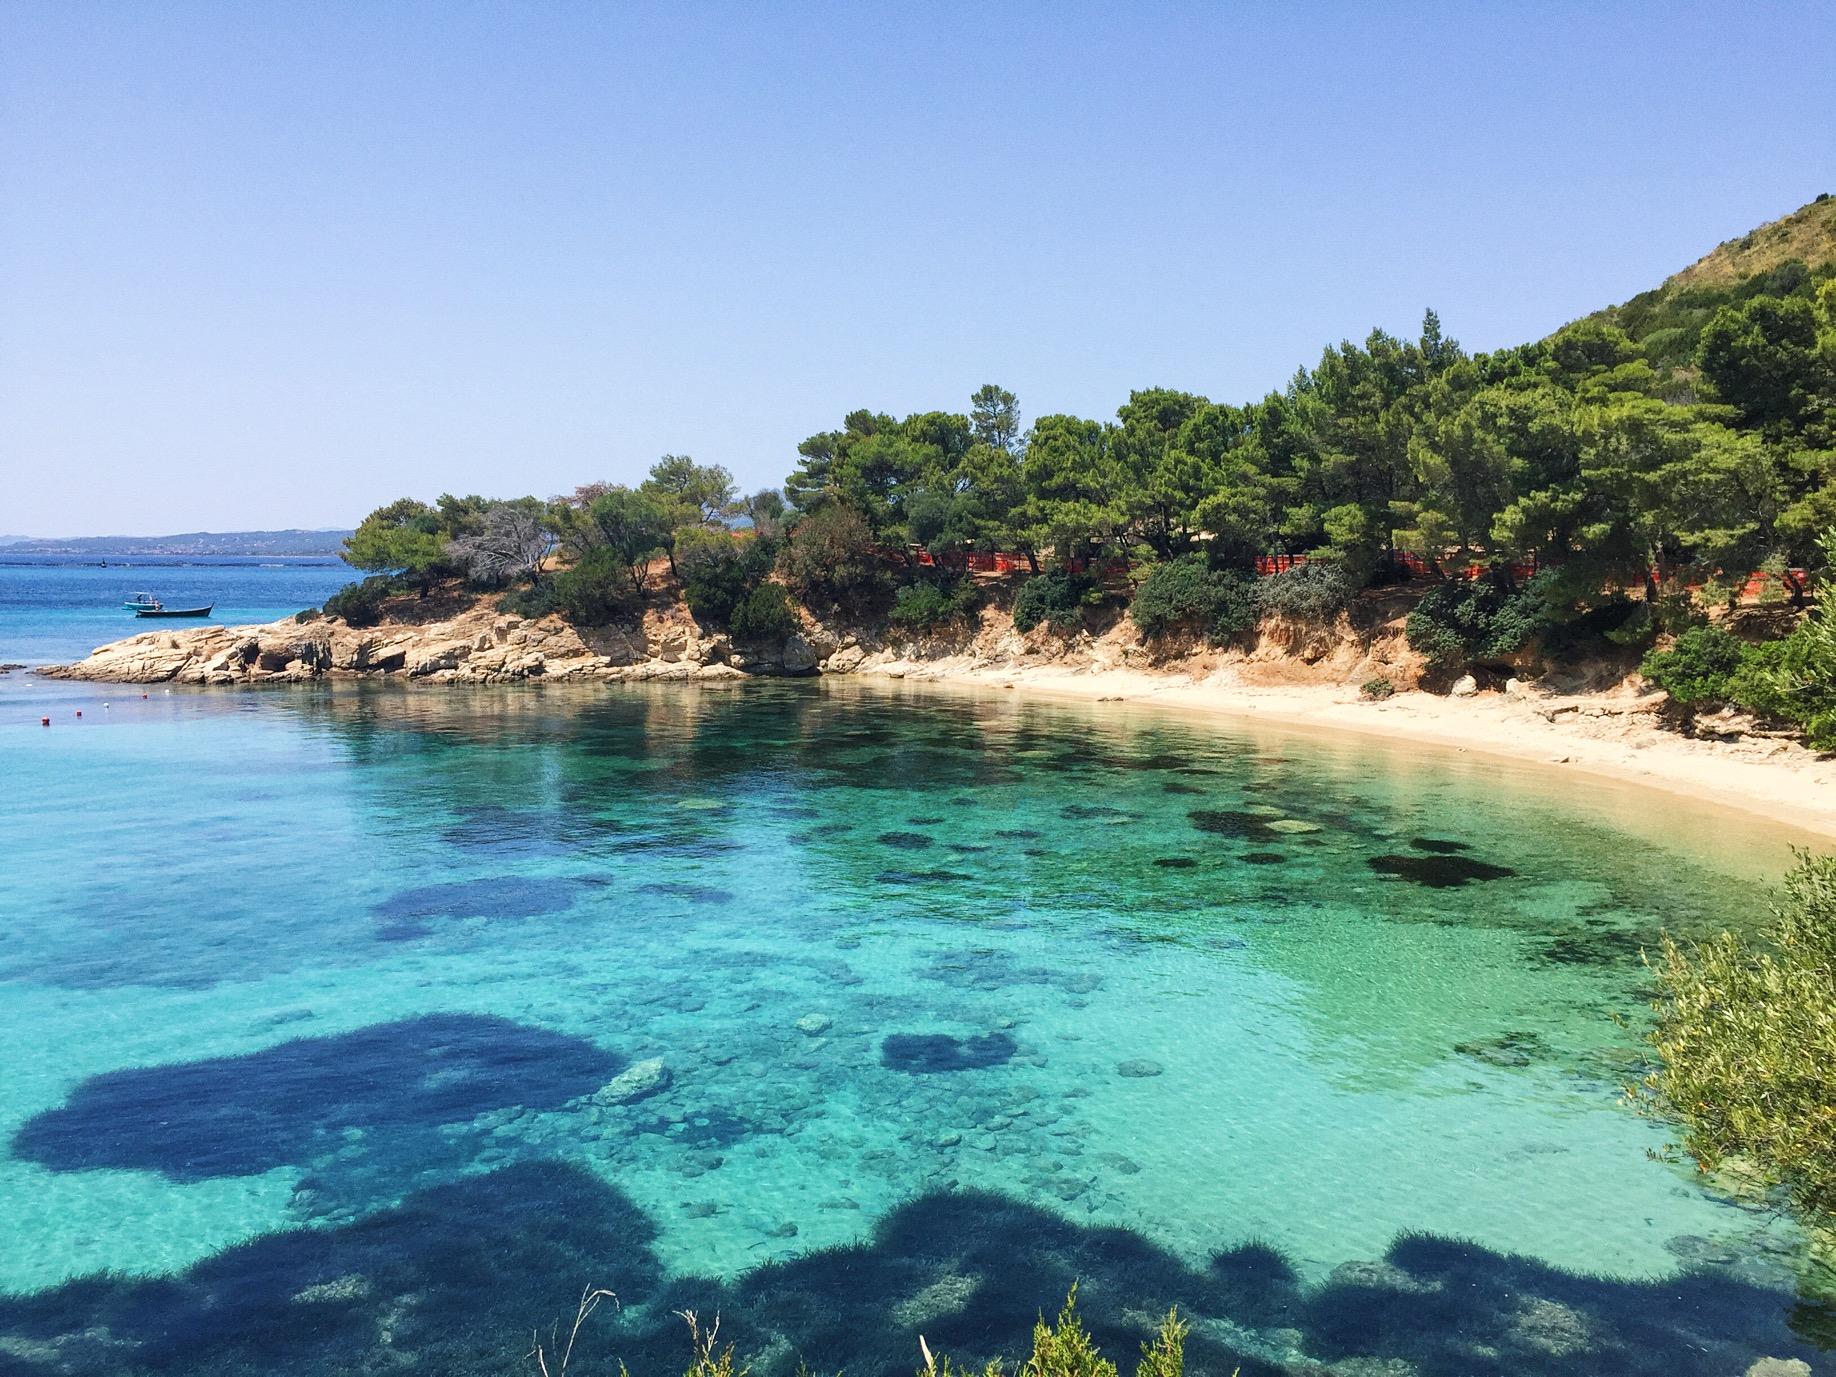 Spiaggia Cala Moresca.